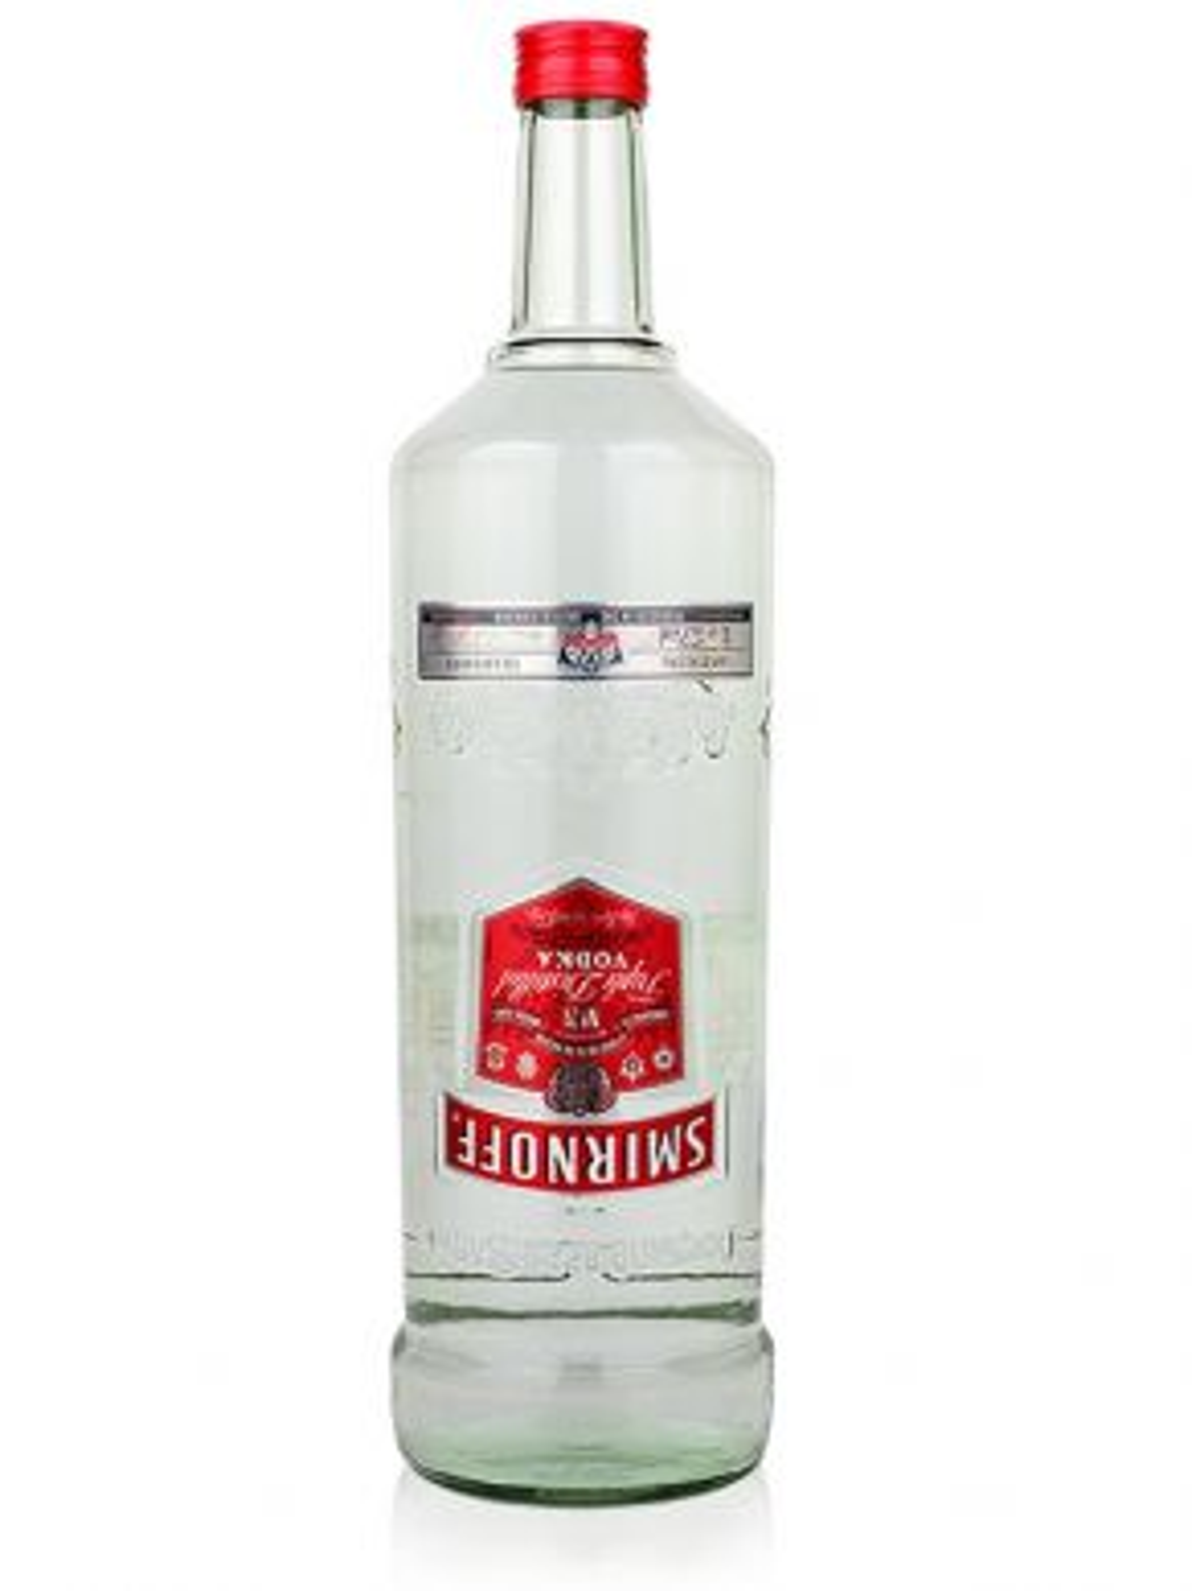 Smirnoff Red Label 3 litre Jeroboam Russian Vodka